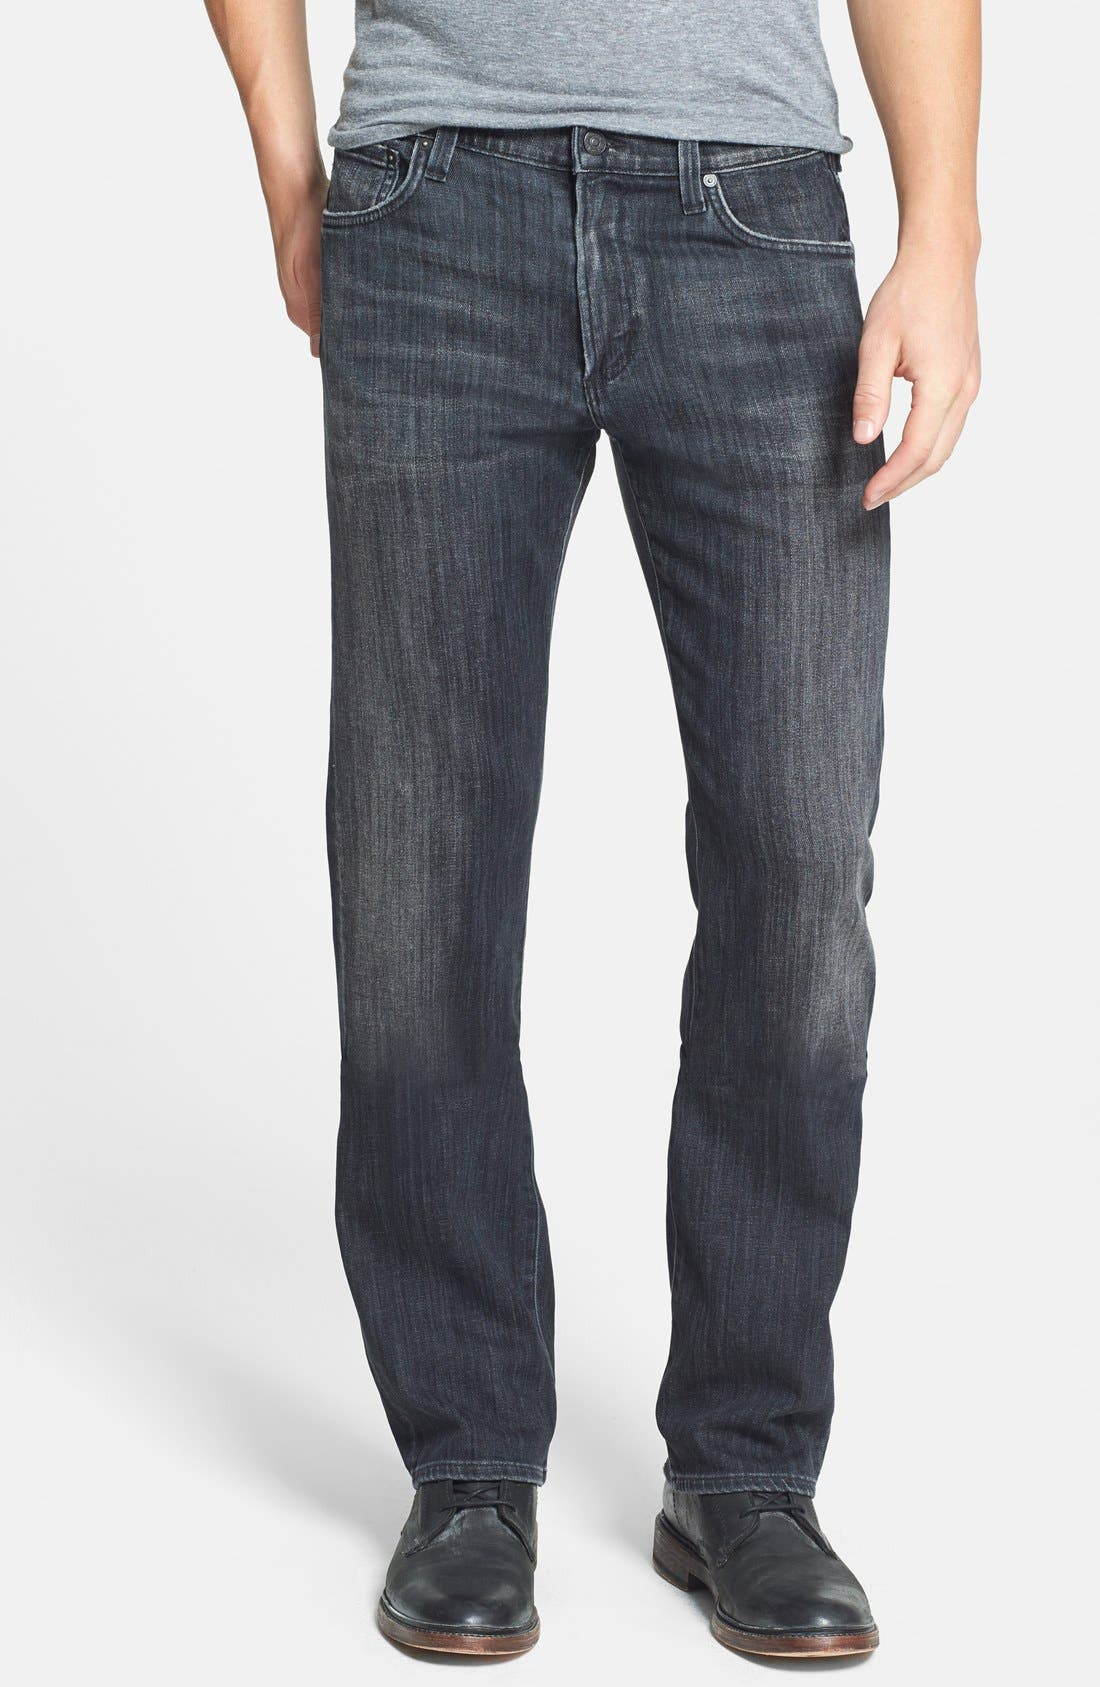 'Sid' Classic Straight Leg Jeans,                             Main thumbnail 1, color,                             CROW